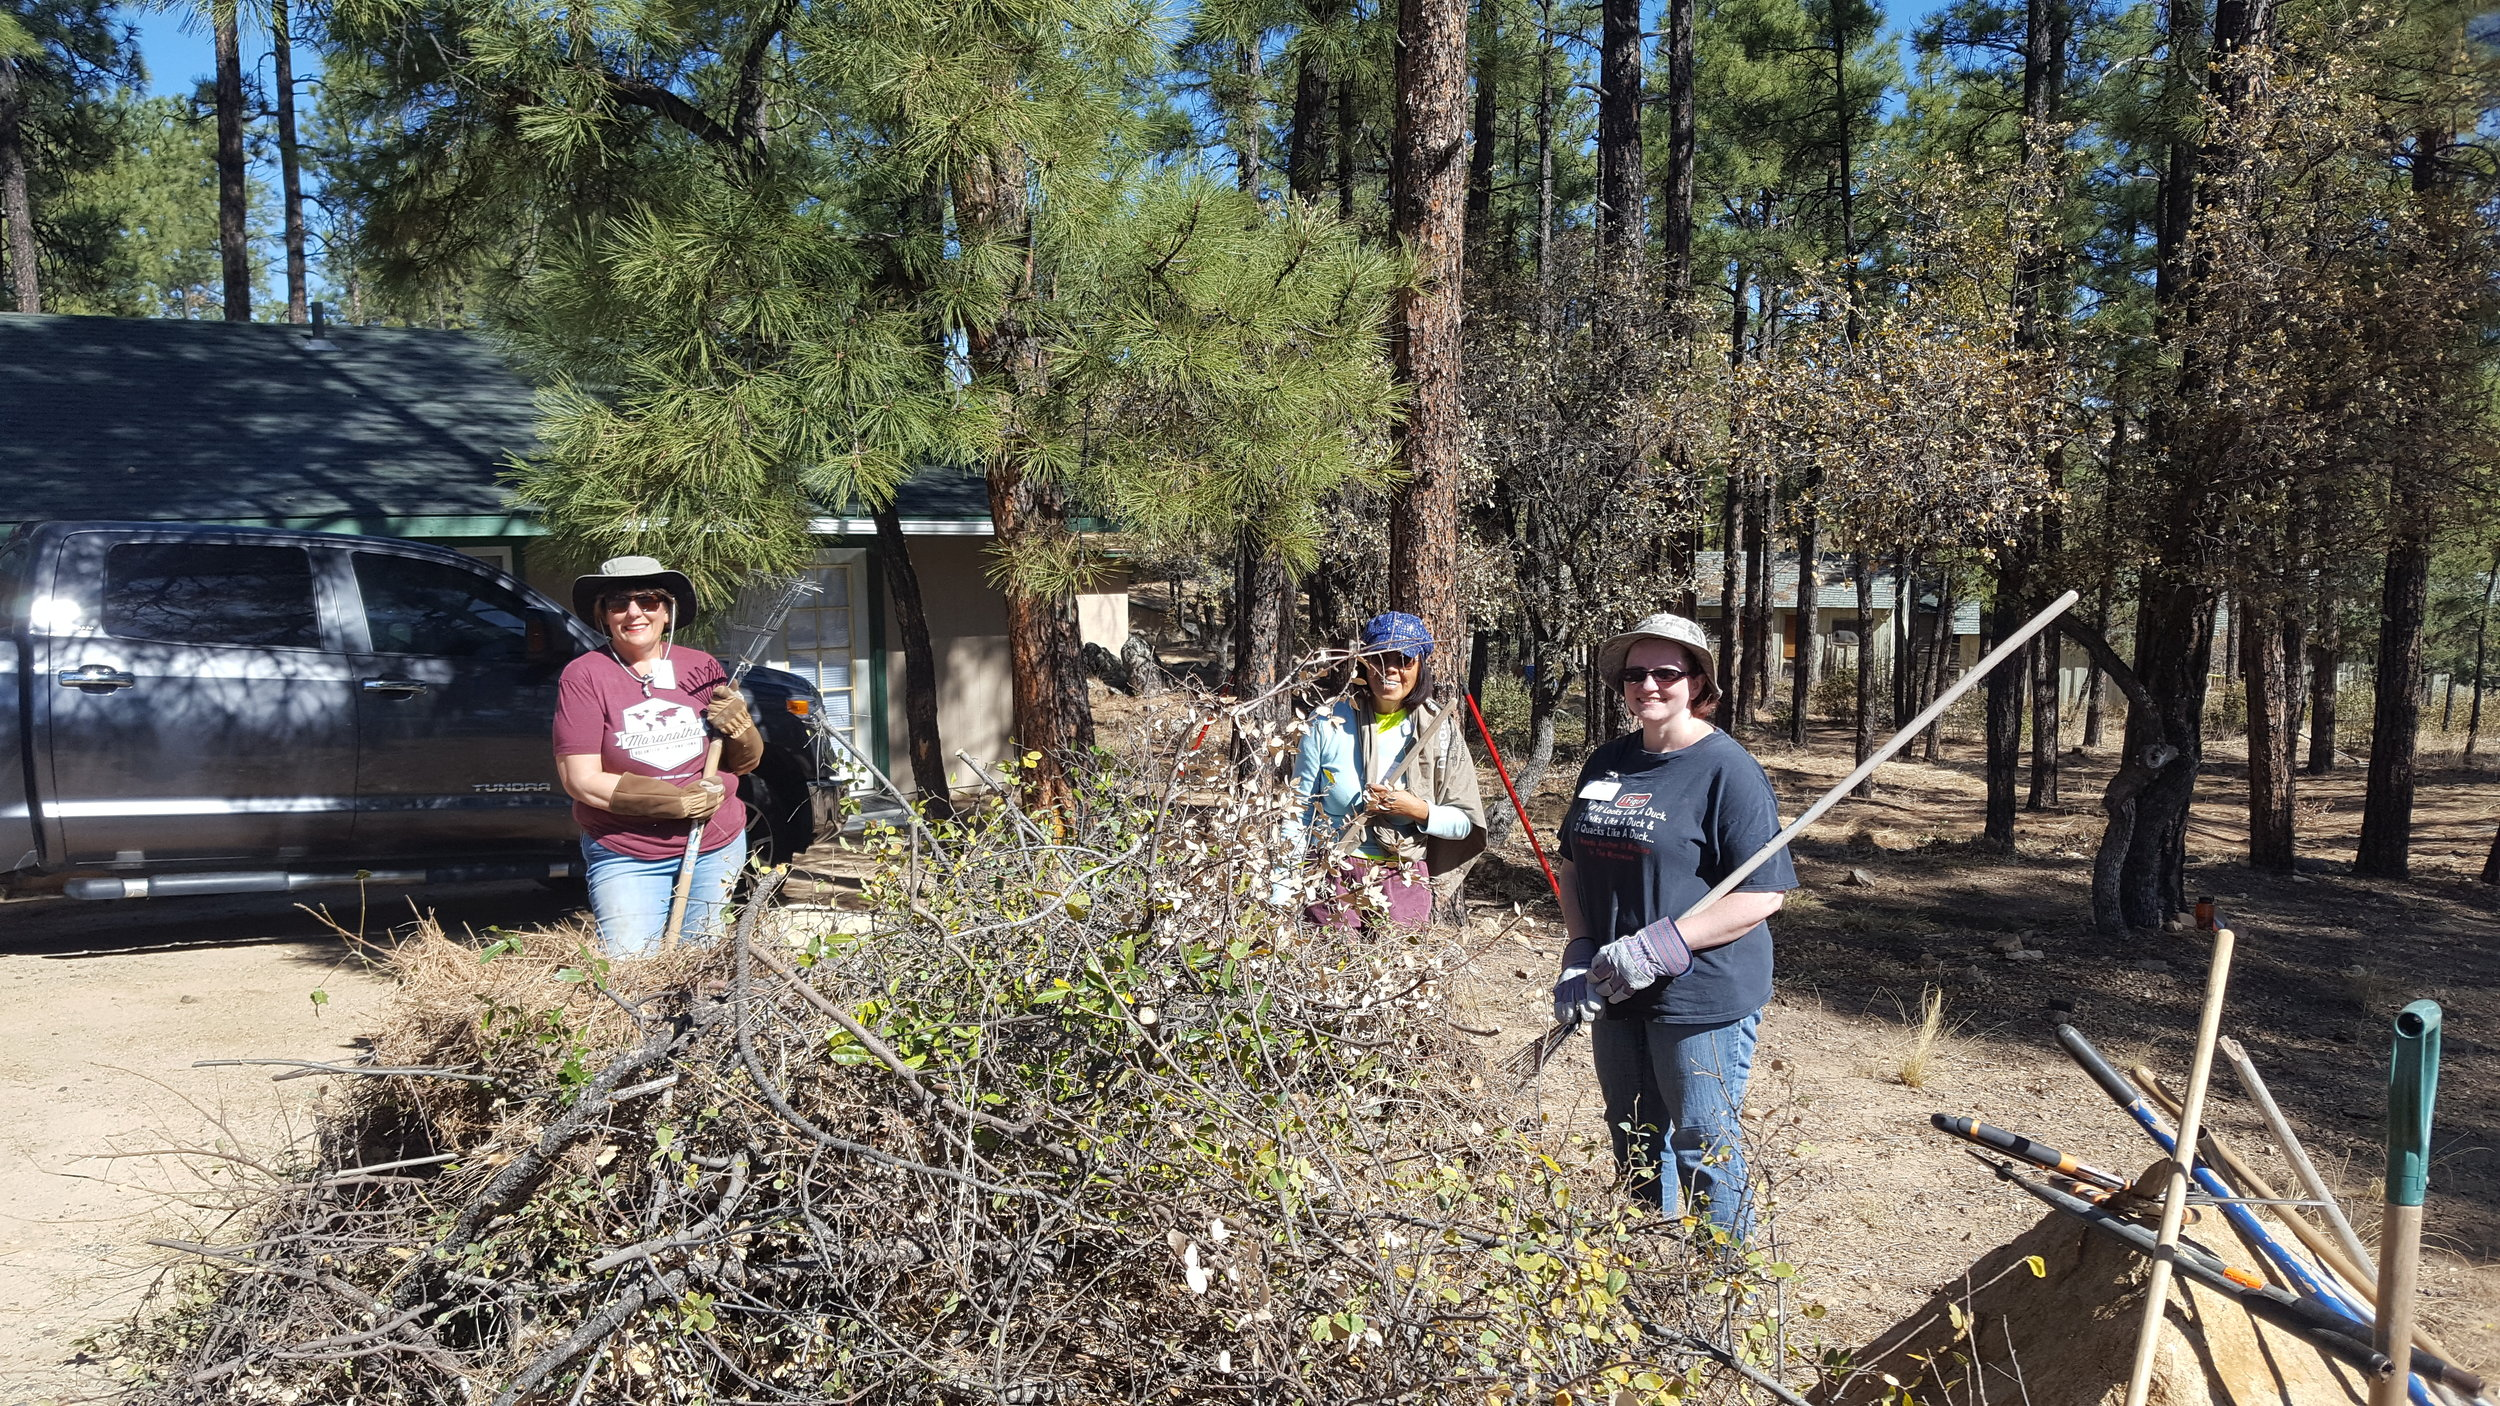 Landscaping crew hard at work!